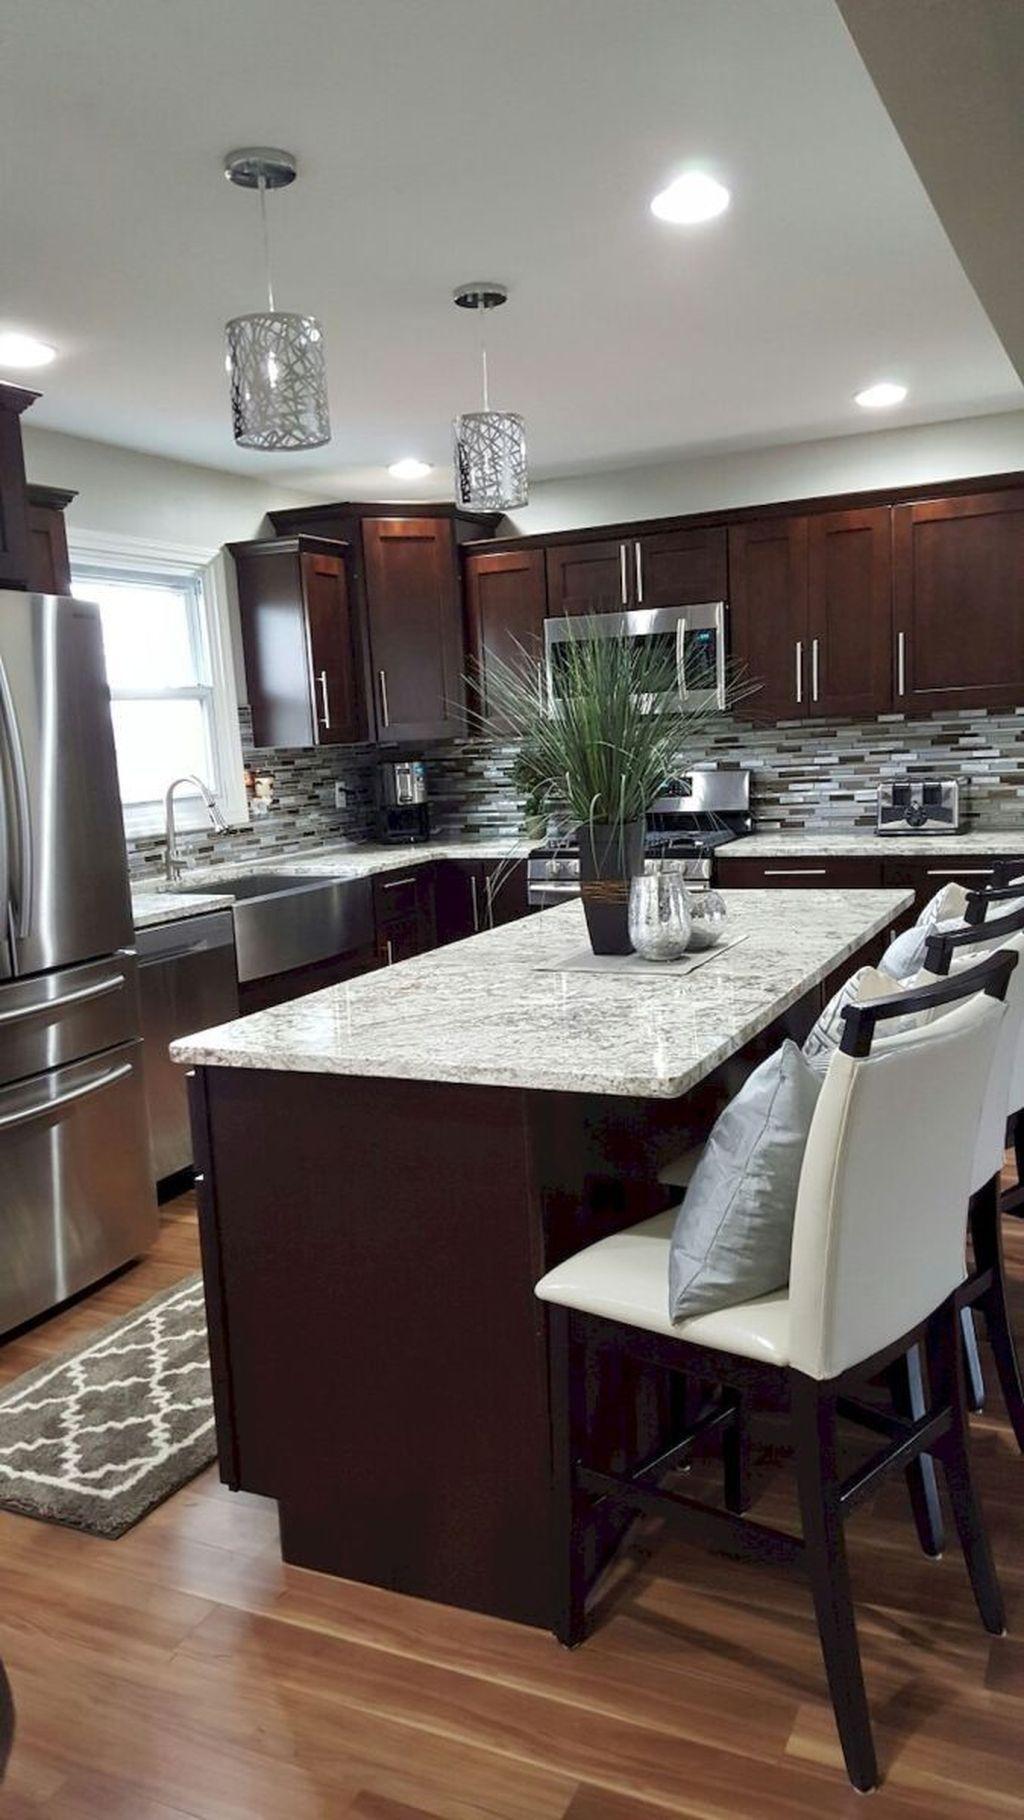 Best 71 Simple Beautiful Kitchen Backsplash Design Ideas On A 400 x 300